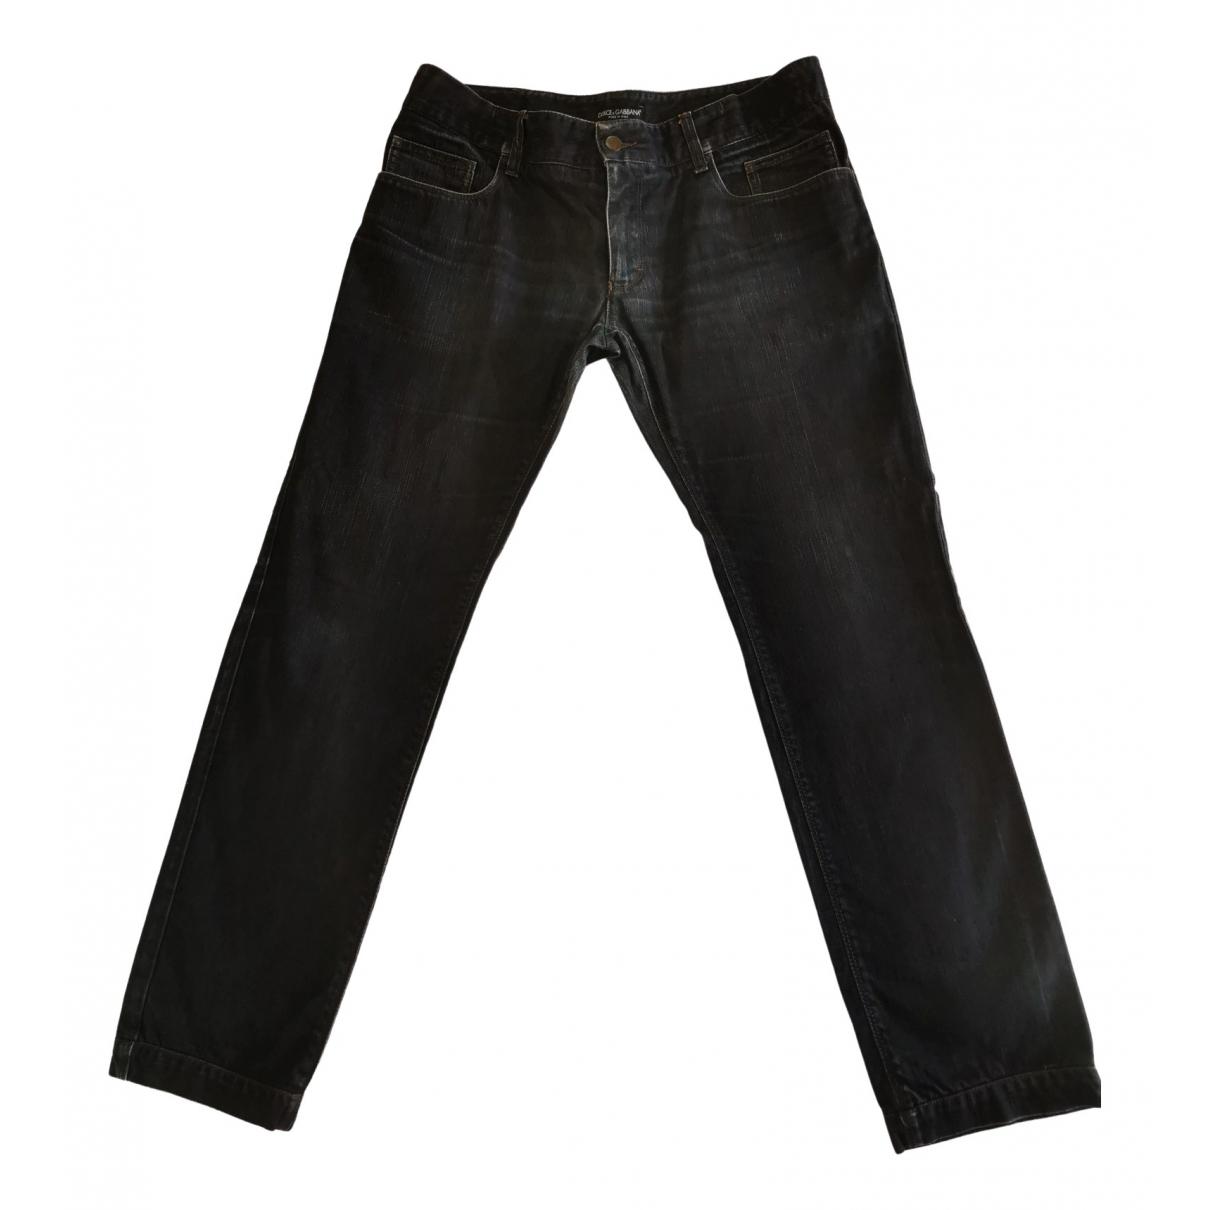 Dolce & Gabbana \N Navy Cotton Jeans for Men 44 FR